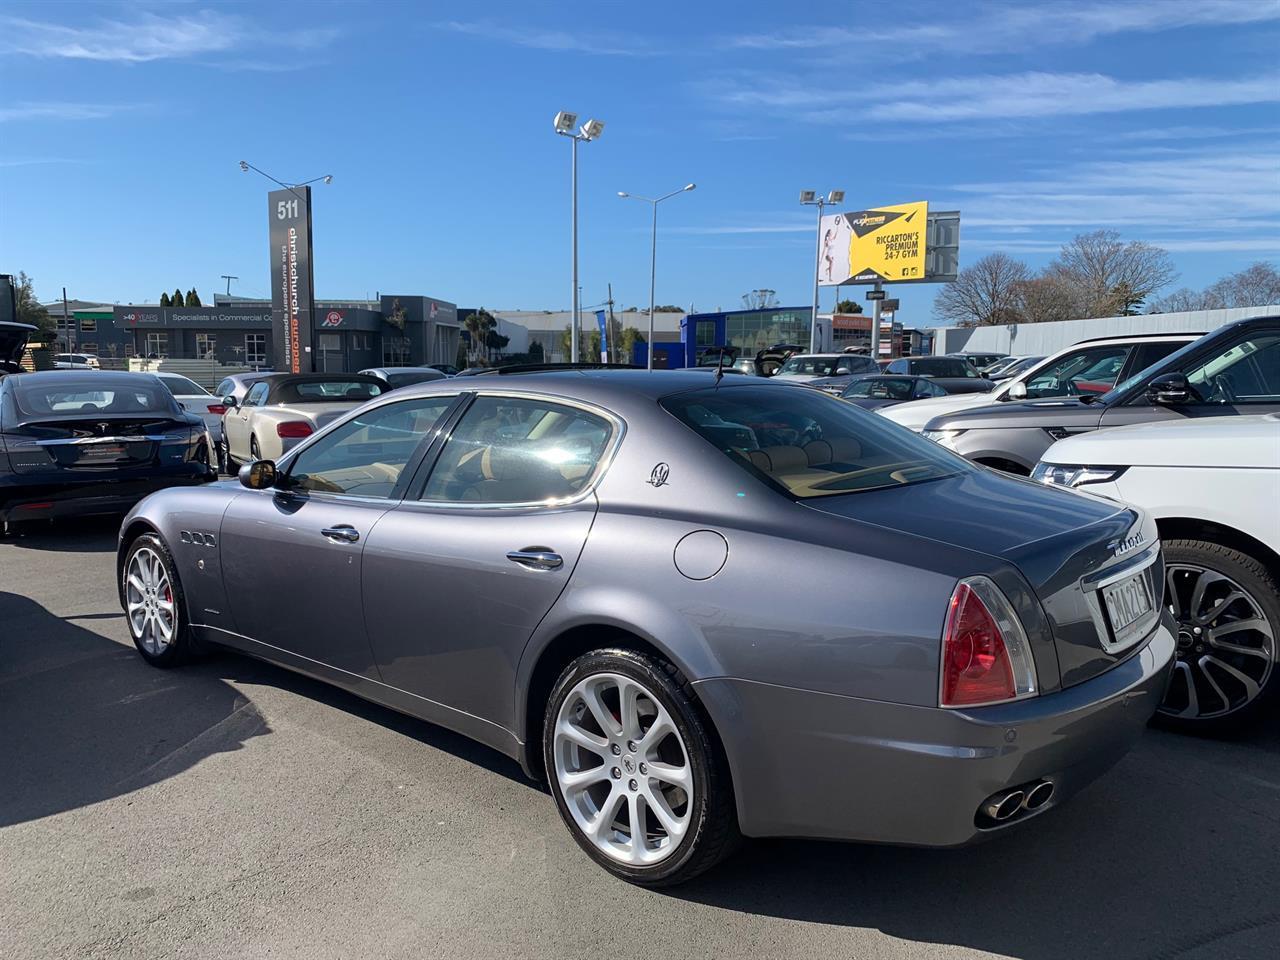 image-2, 2005 Maserati Quattroporte 4.2 V8 NZ New Sedan at Christchurch